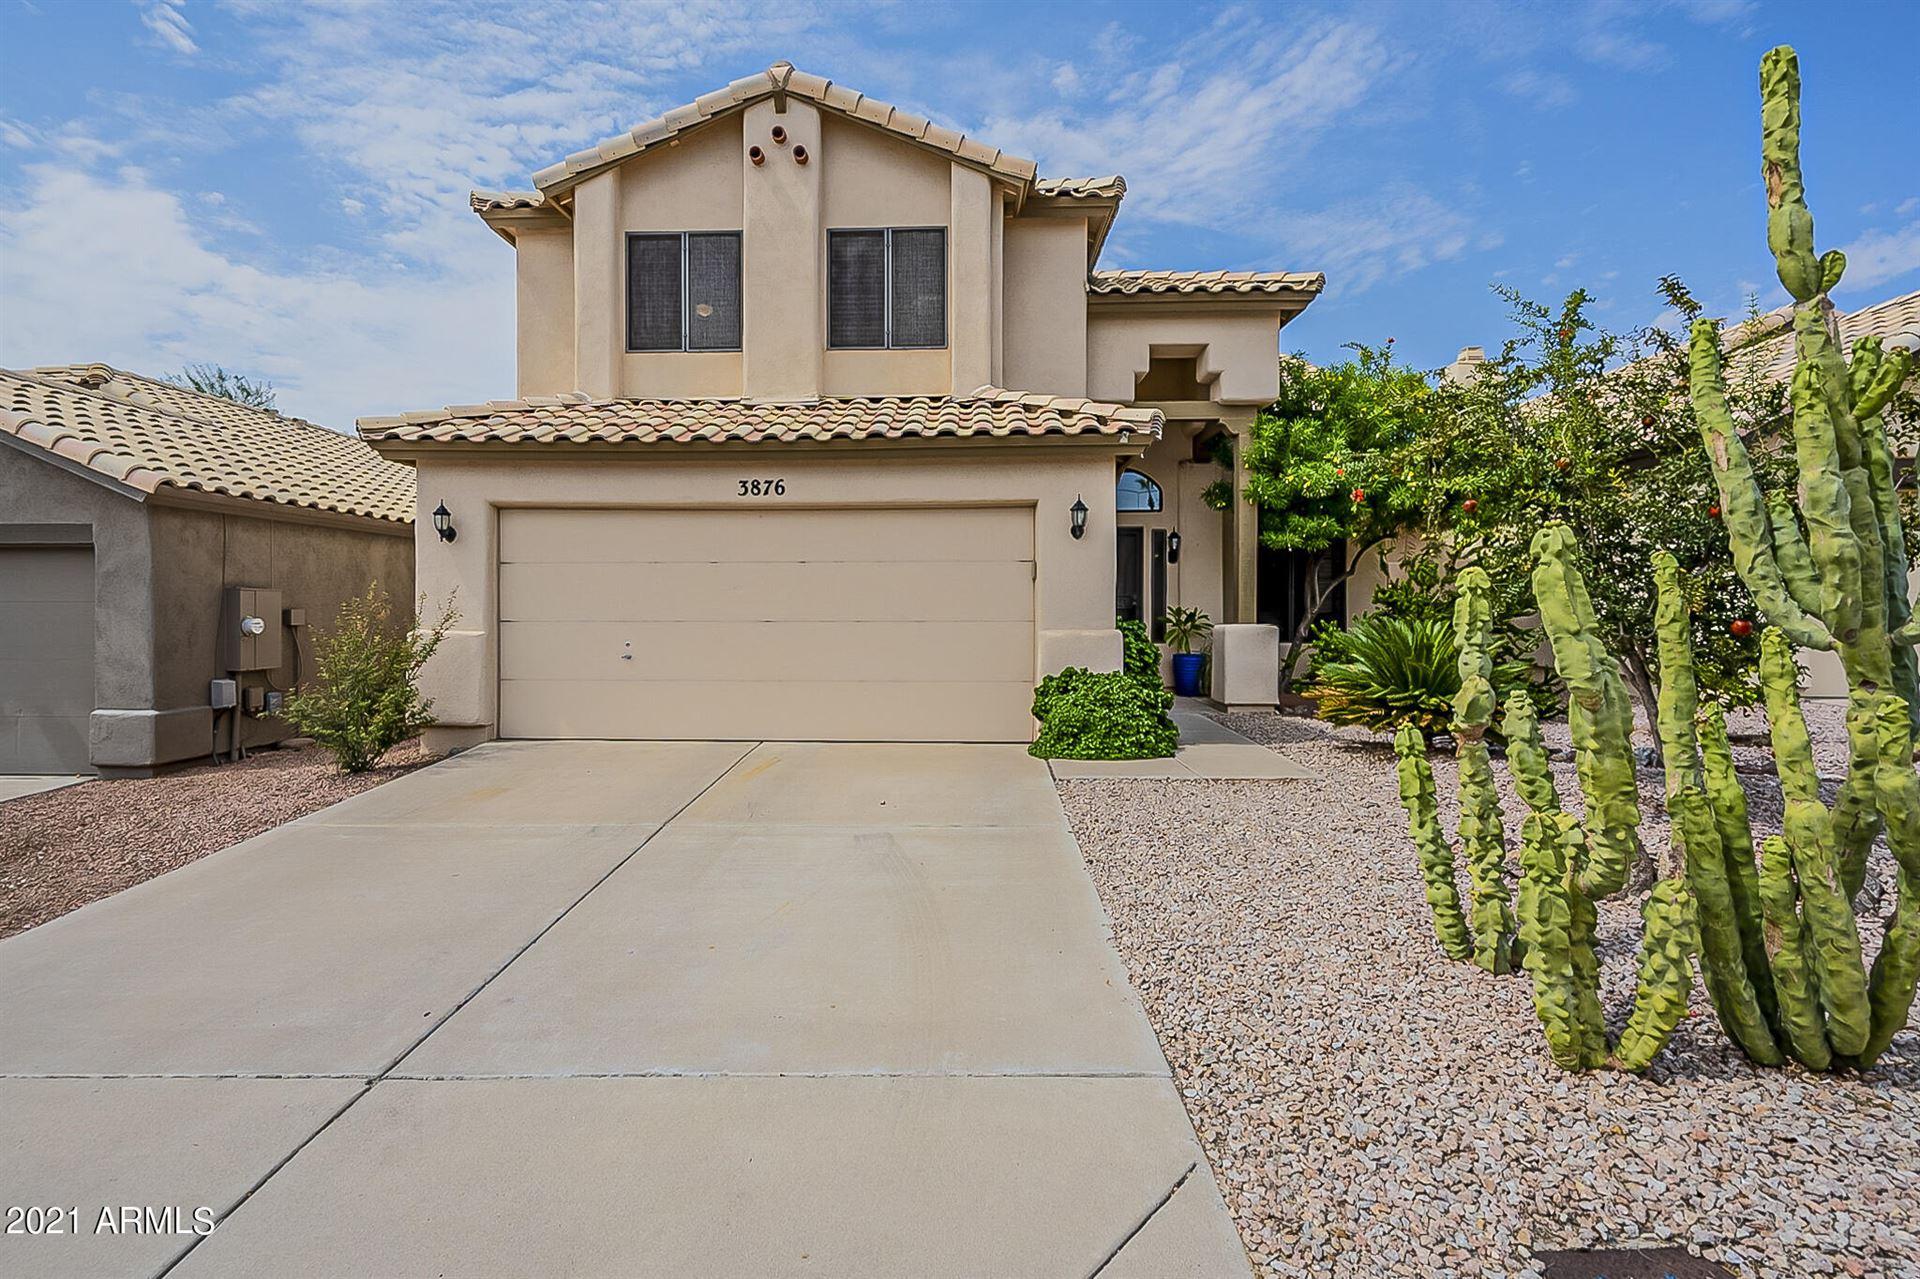 Photo of 3876 E MOUNTAIN SKY Avenue, Phoenix, AZ 85044 (MLS # 6296282)